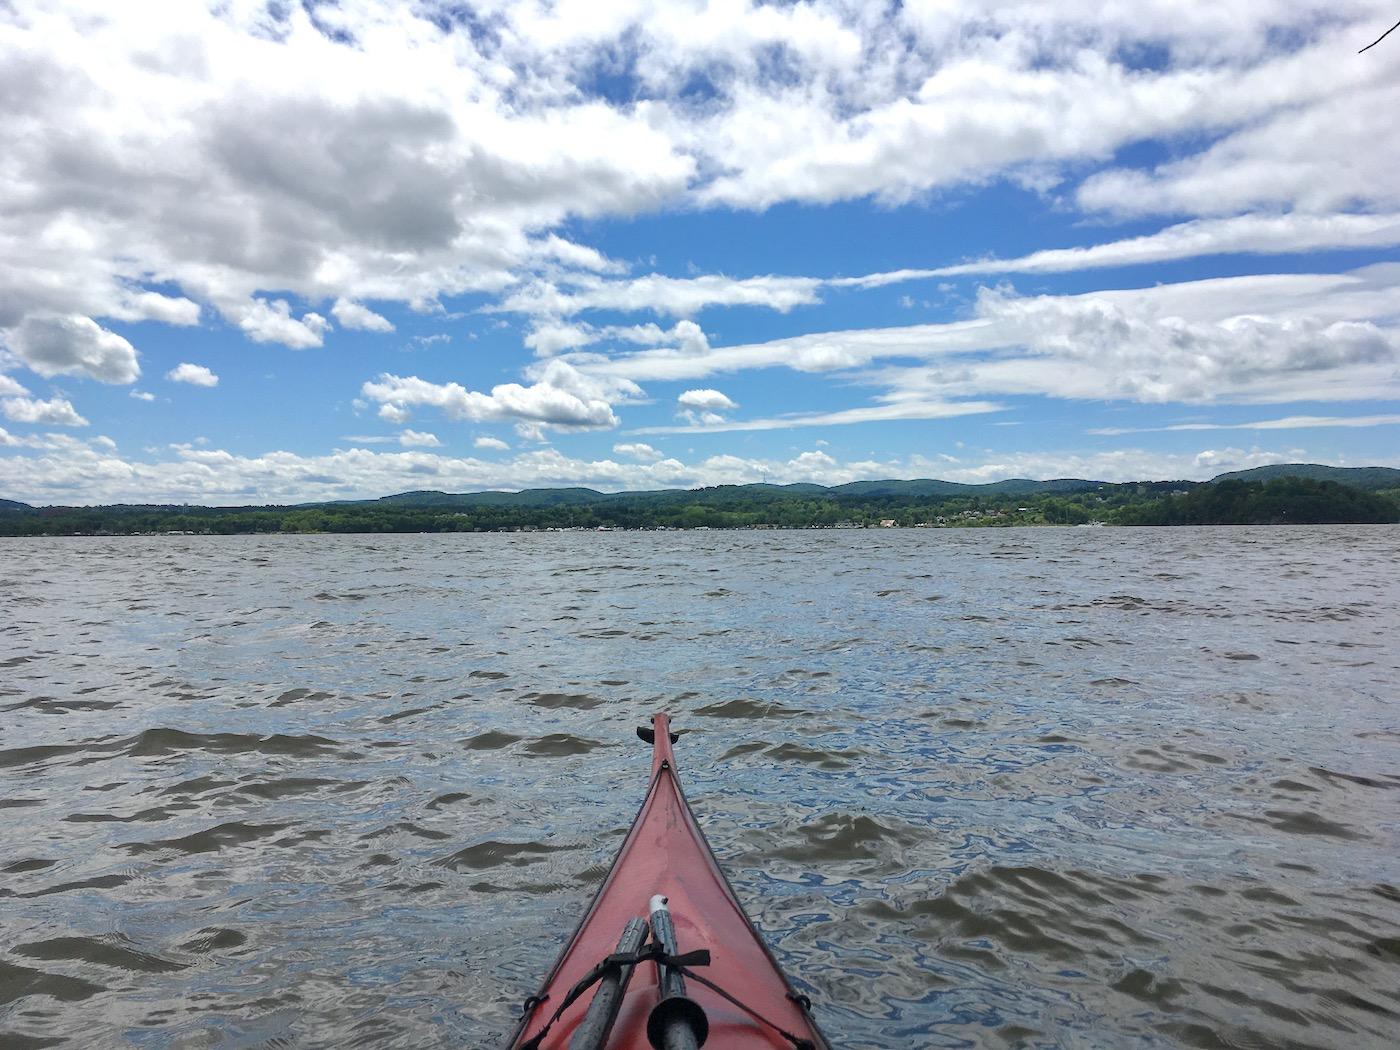 kayaking on the Hudson River